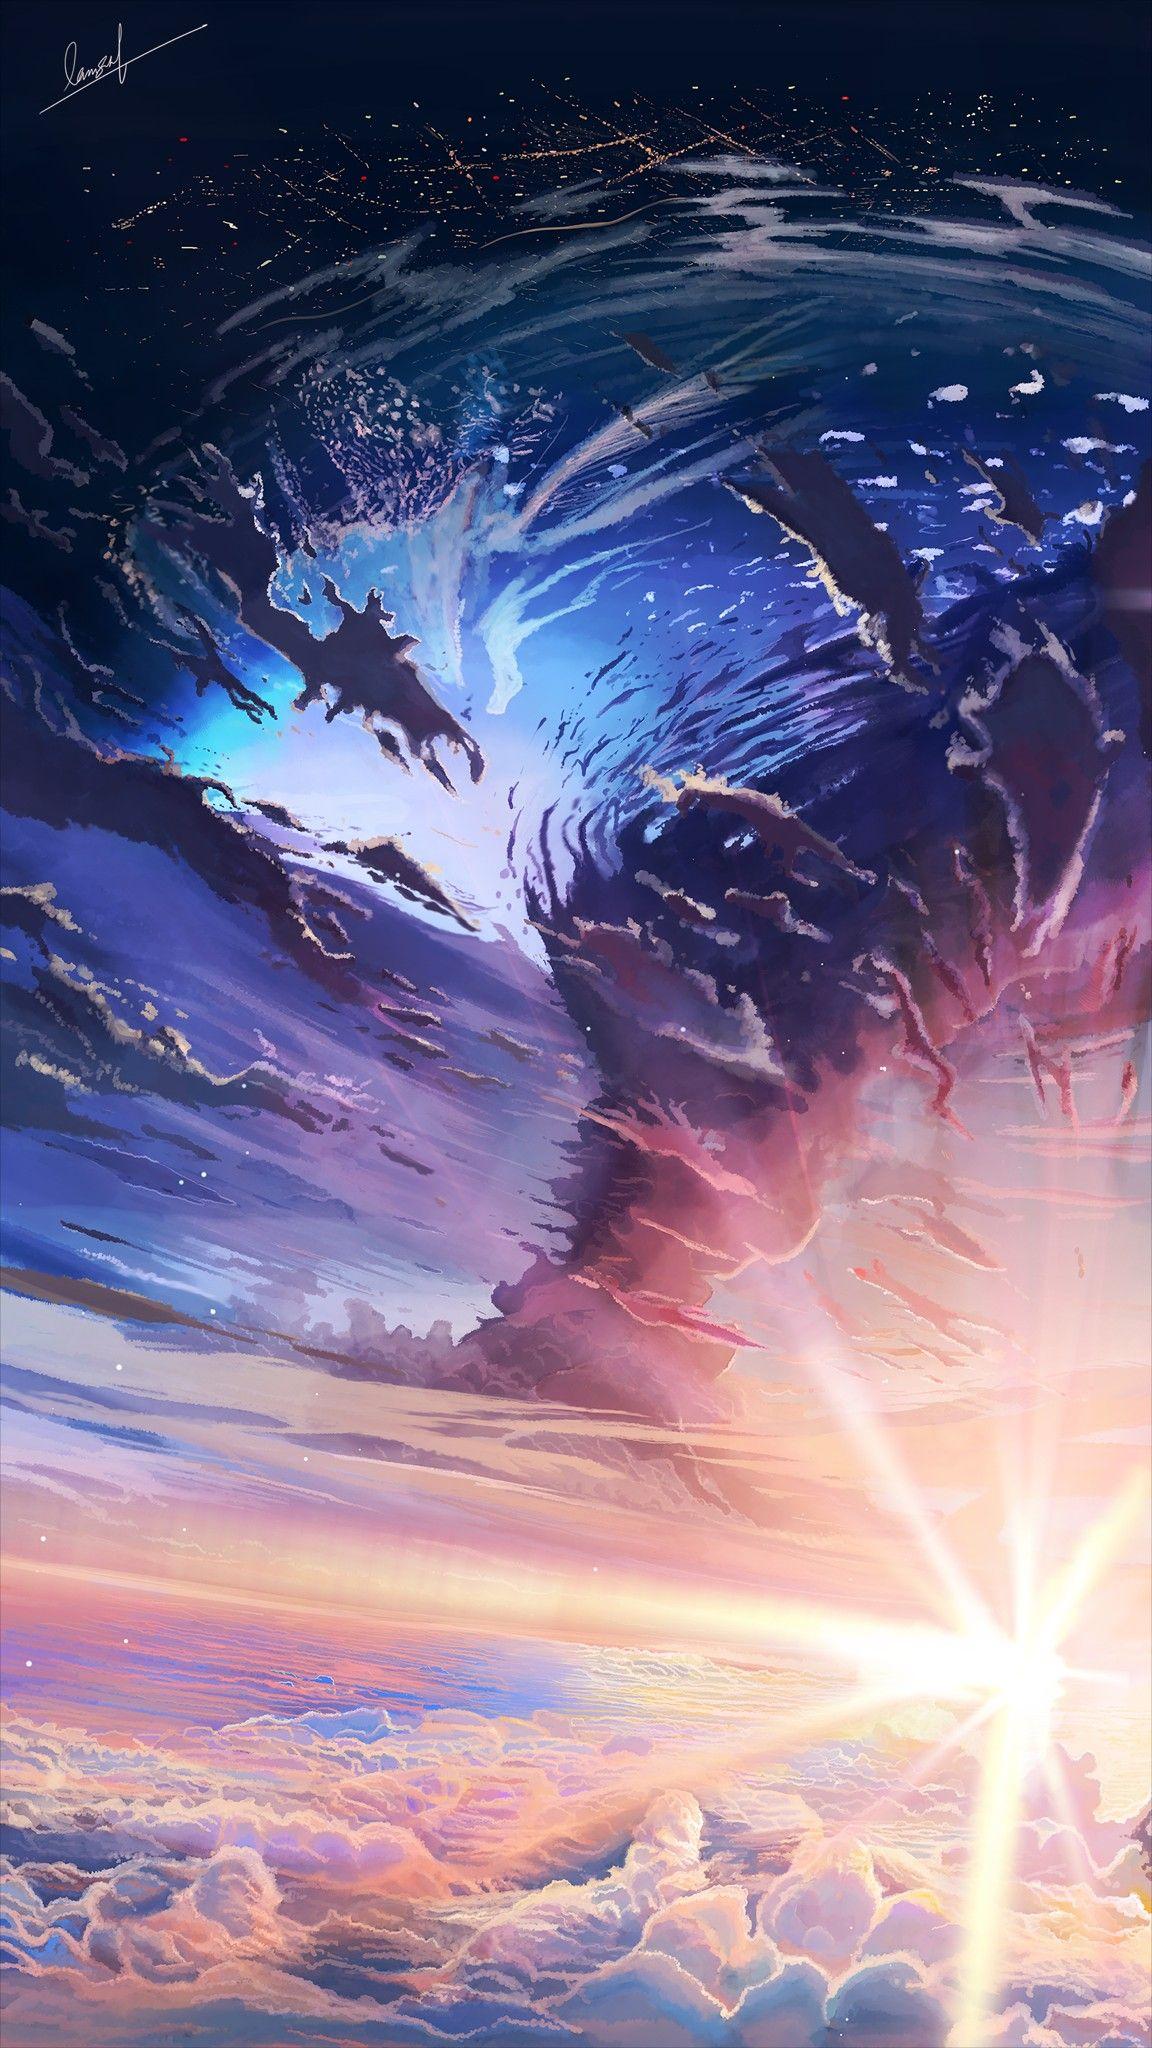 Anime Sky Wallpapers View Beautiful Backgrounds Art Sunset Animewallpapers K Fantasy Art Landscapes Anime Backgrounds Wallpapers Anime Scenery